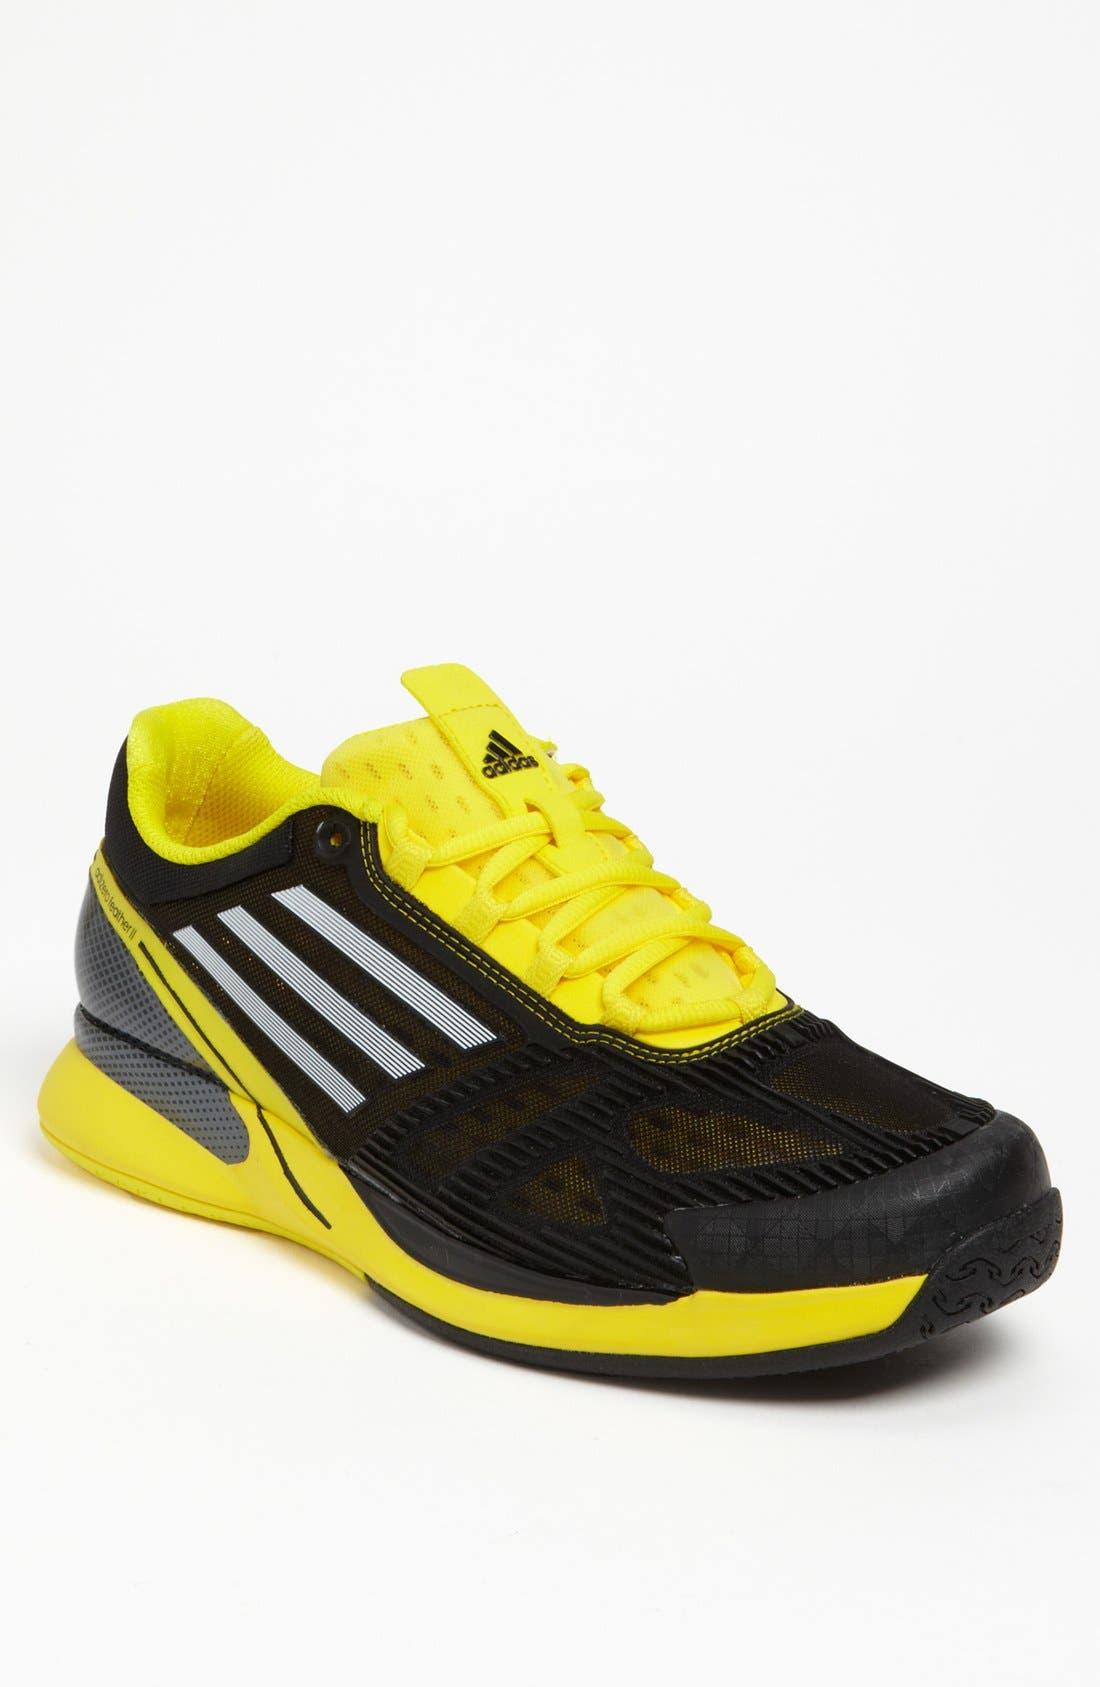 Alternate Image 1 Selected - adidas 'CLIMACOOL® adizero Feather II' Tennis Shoe (Men)